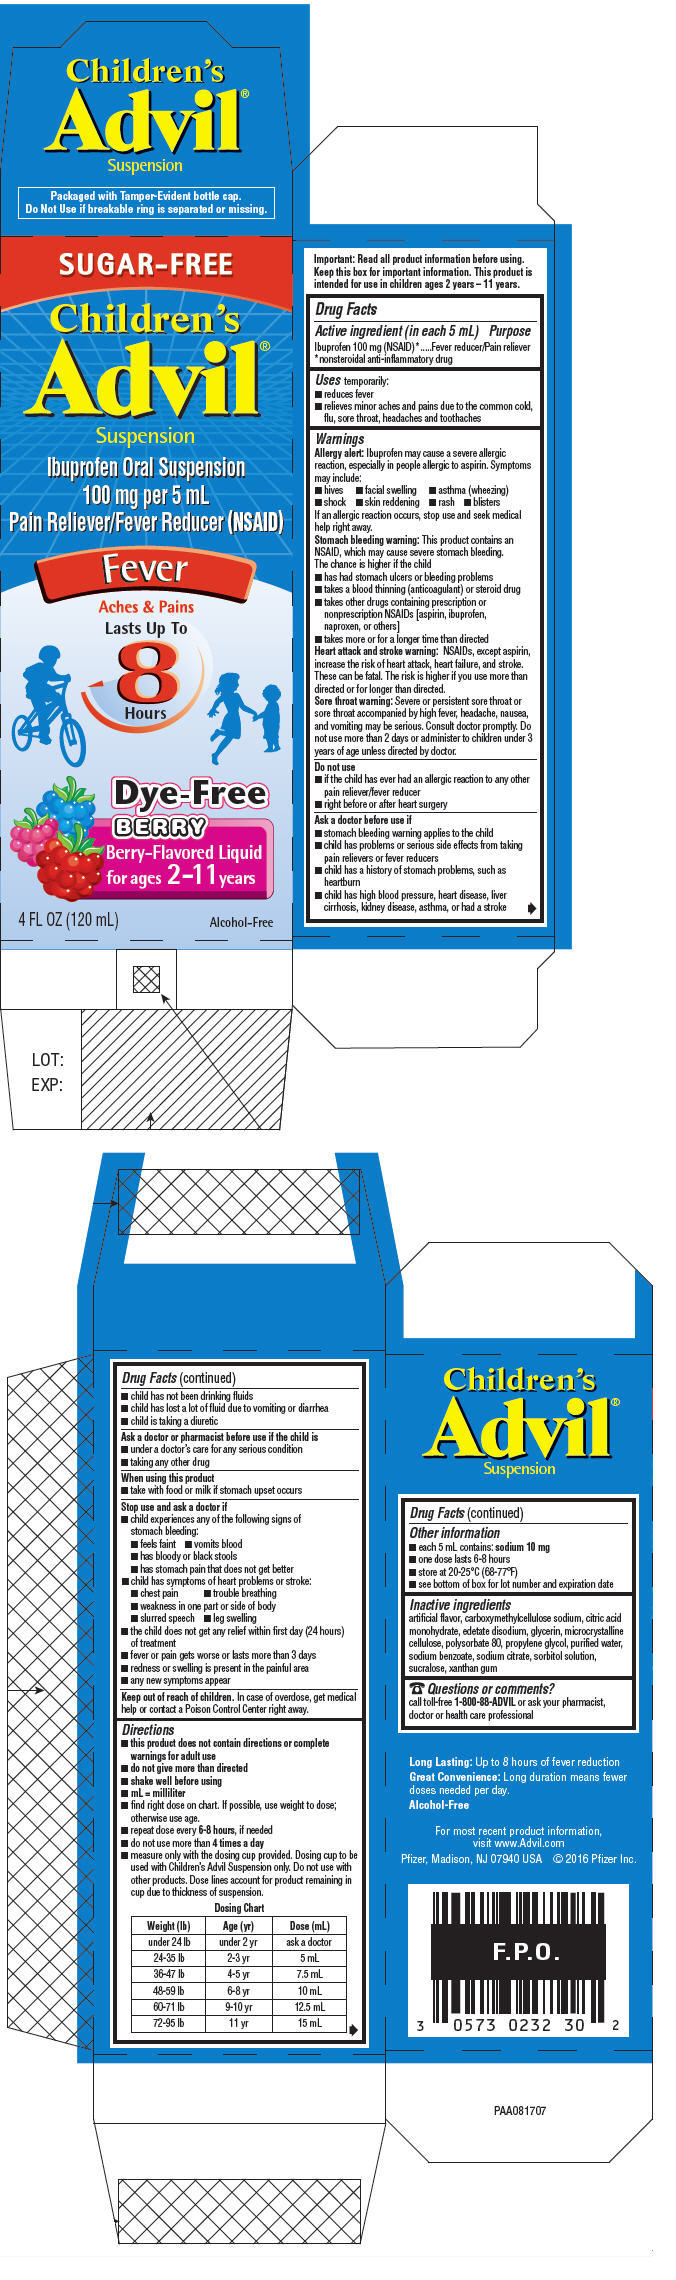 PRINCIPAL DISPLAY PANEL - 120 mL Bottle Carton - Berry-Flavored